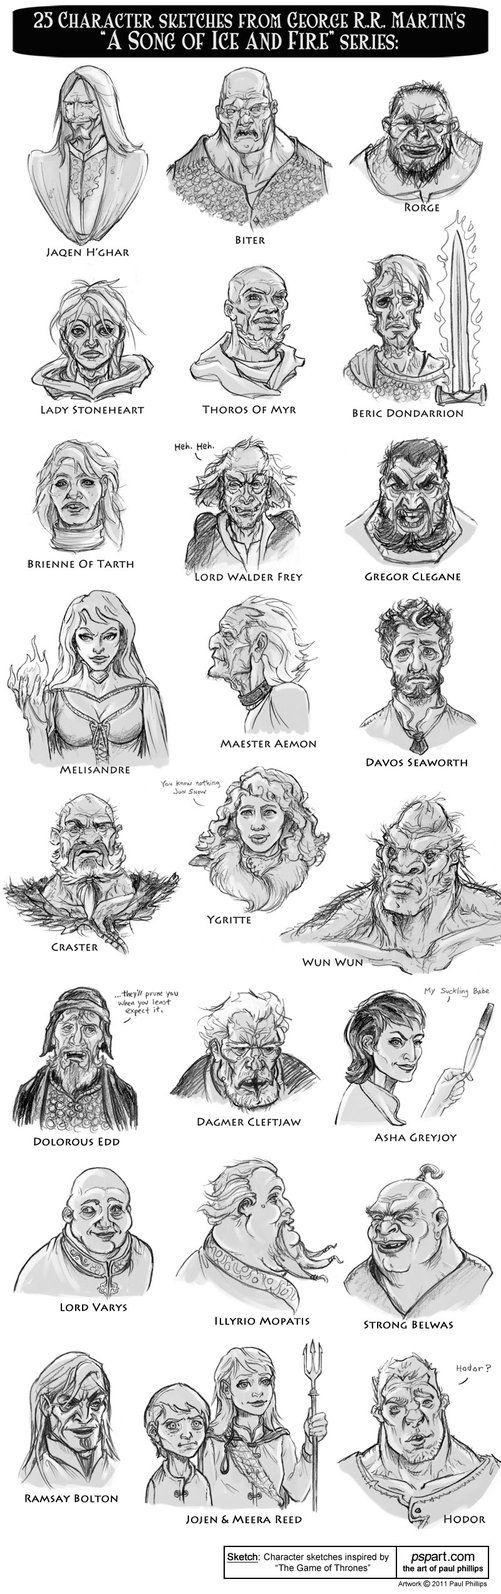 Game of Thrones Character Art by PaulPhillips, via deviantart